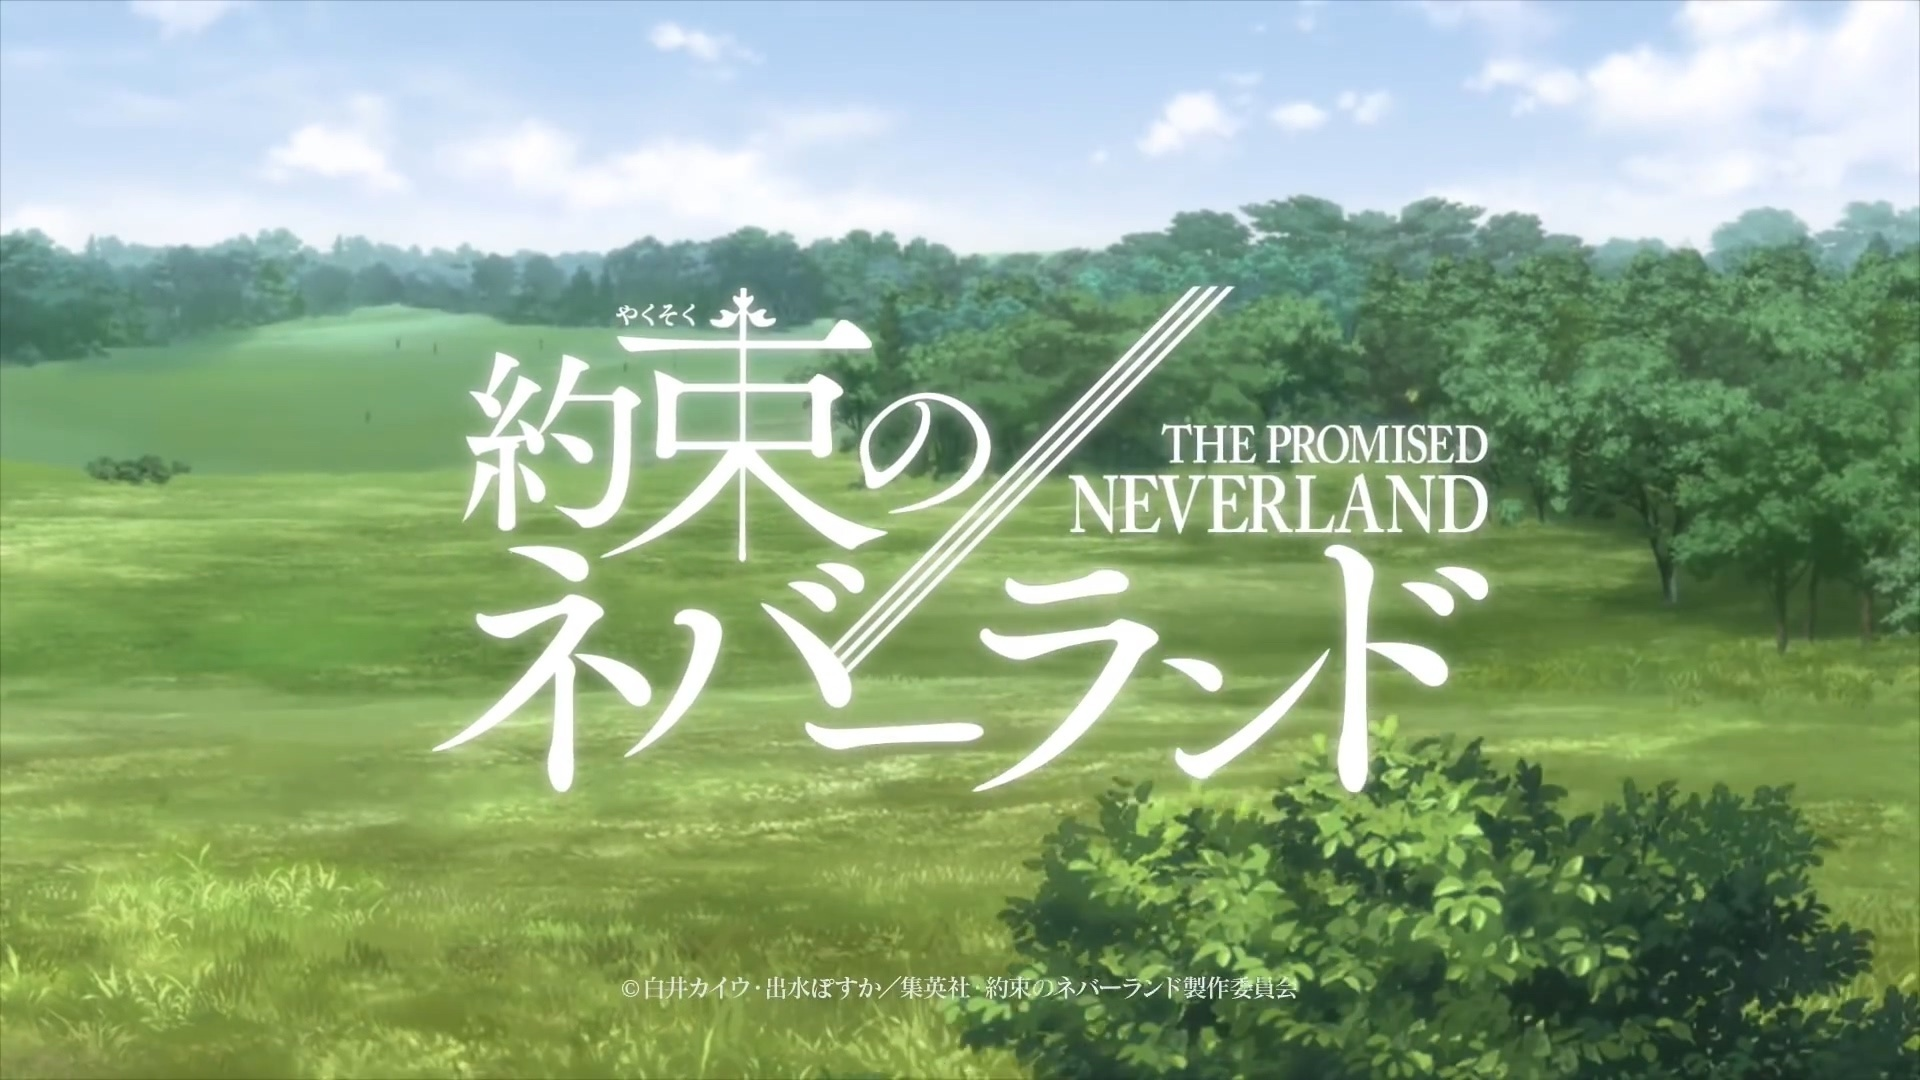 TV動畫《約定的夢幻島》公開第二部預告,將於明年上映